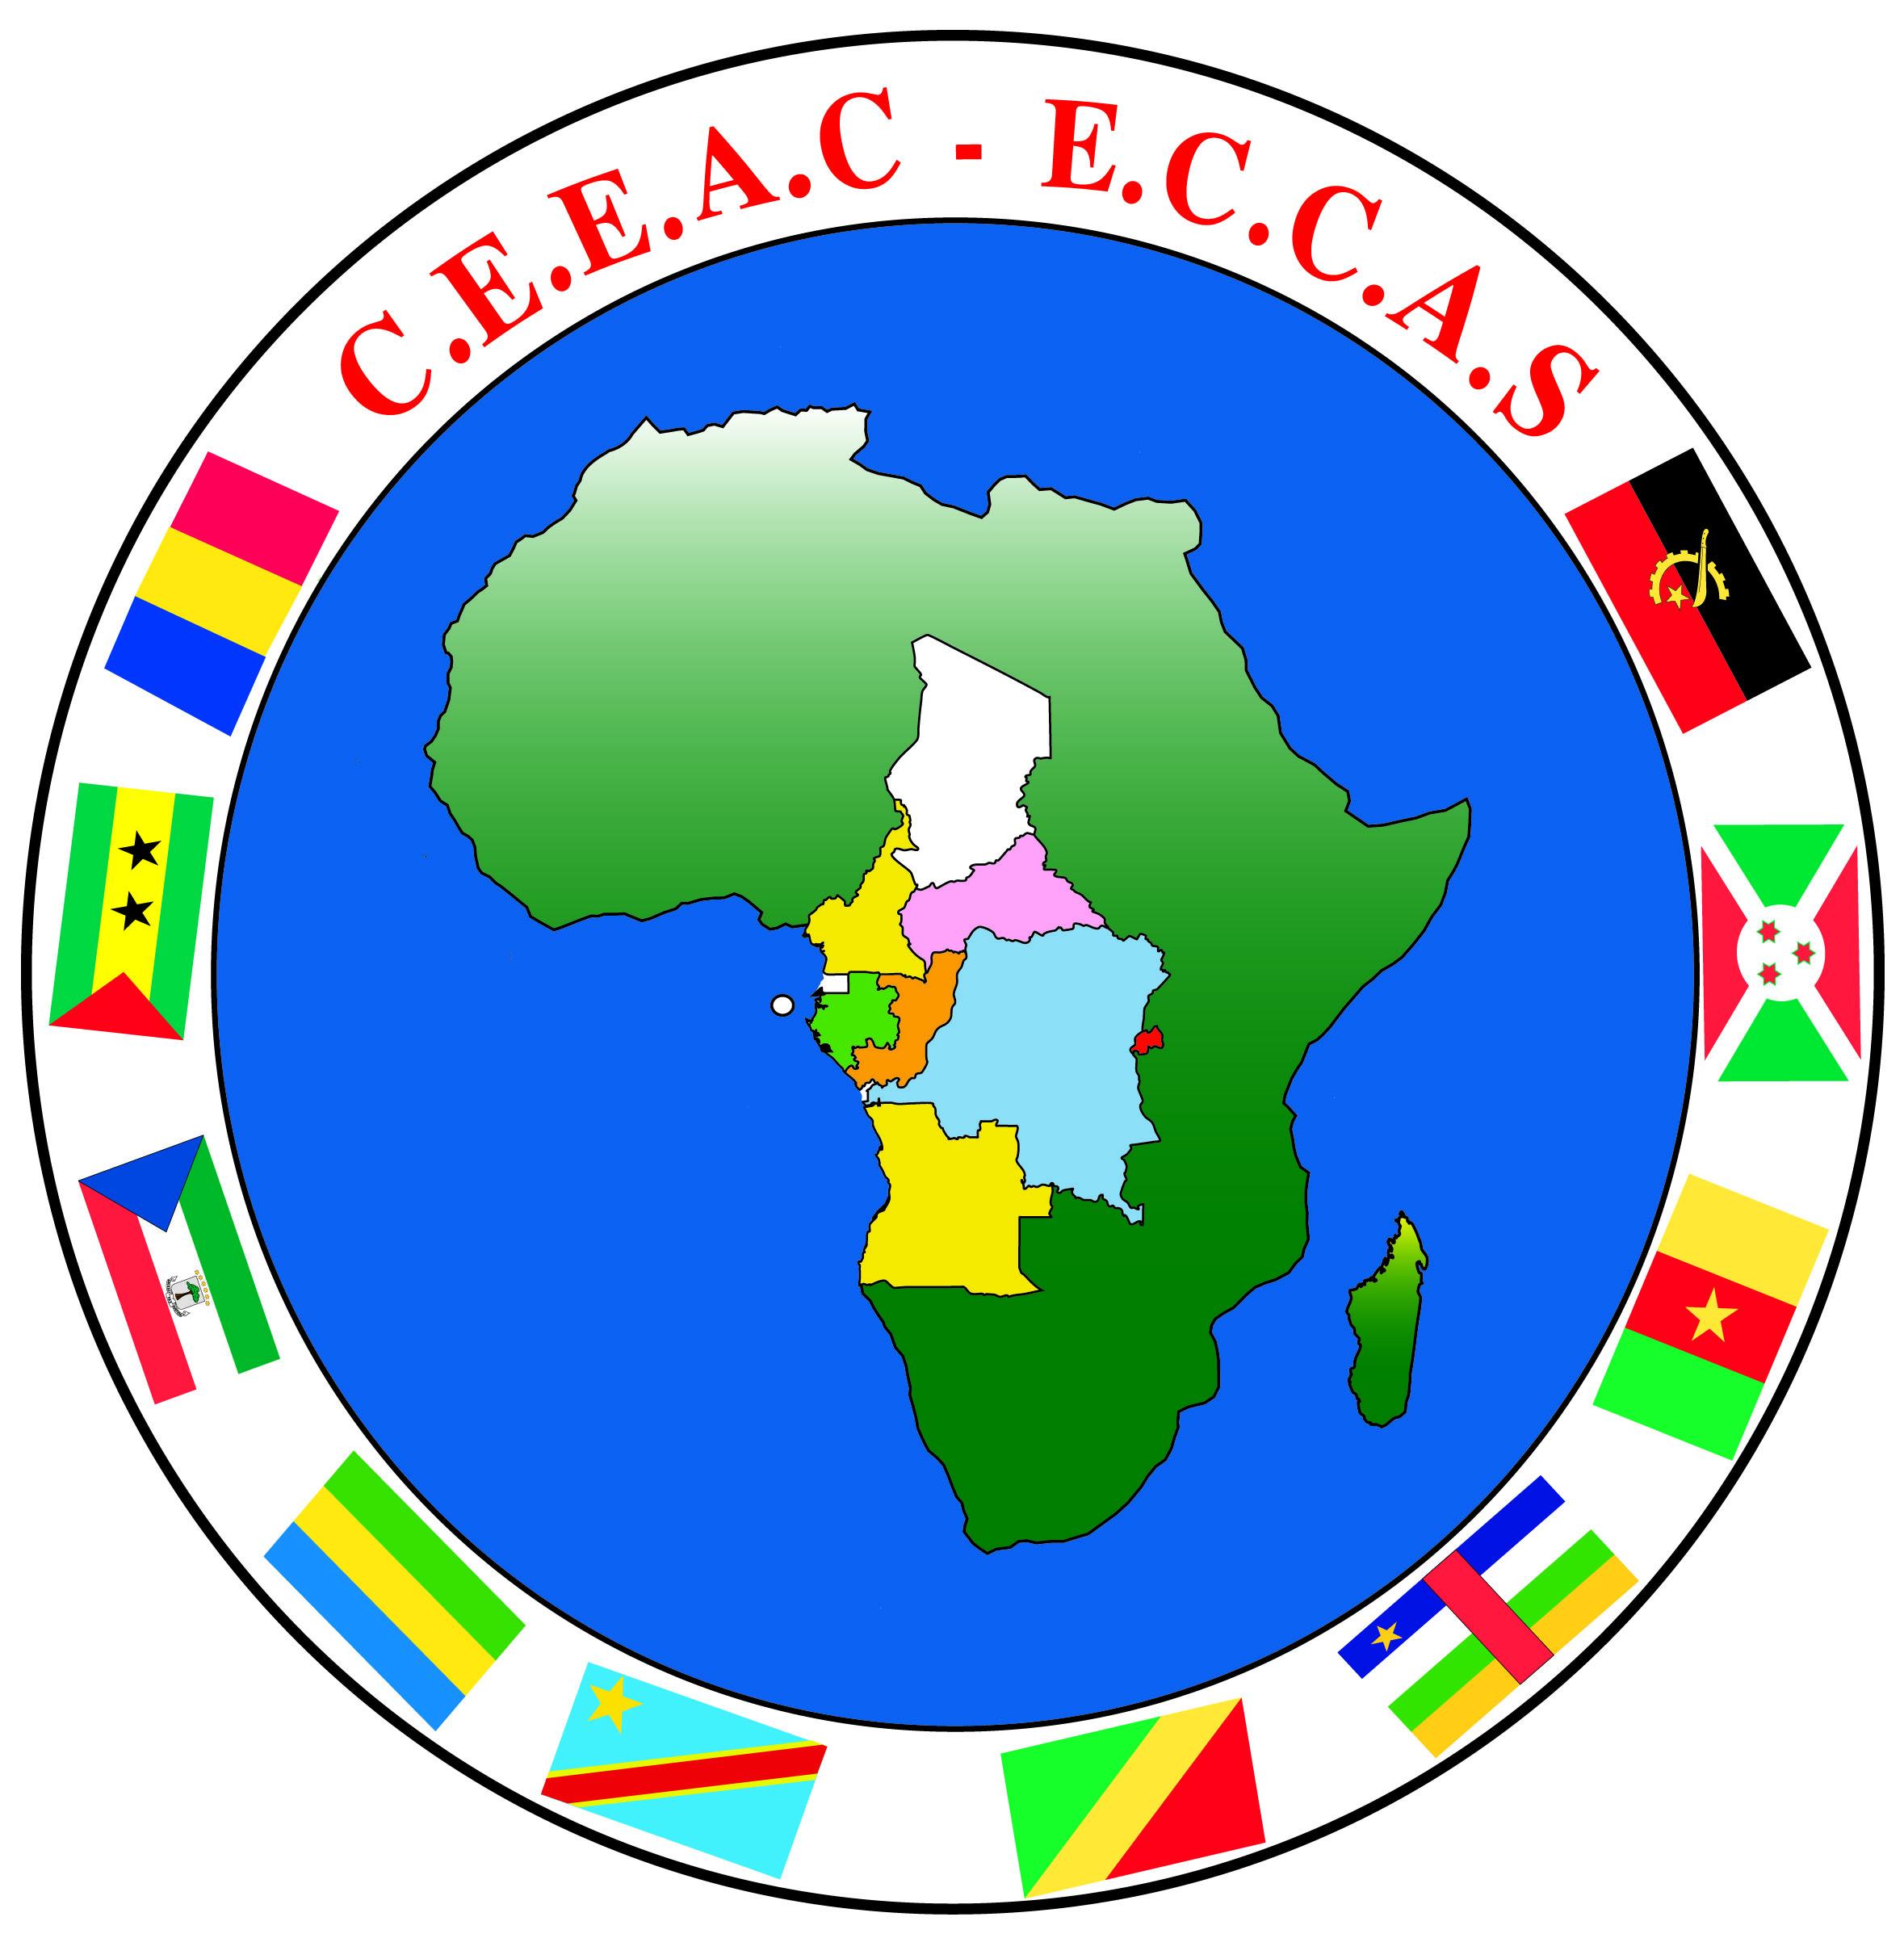 Le conseil des ministres de la CEEAC adopte un budget de 1 920 702 000 FCFA